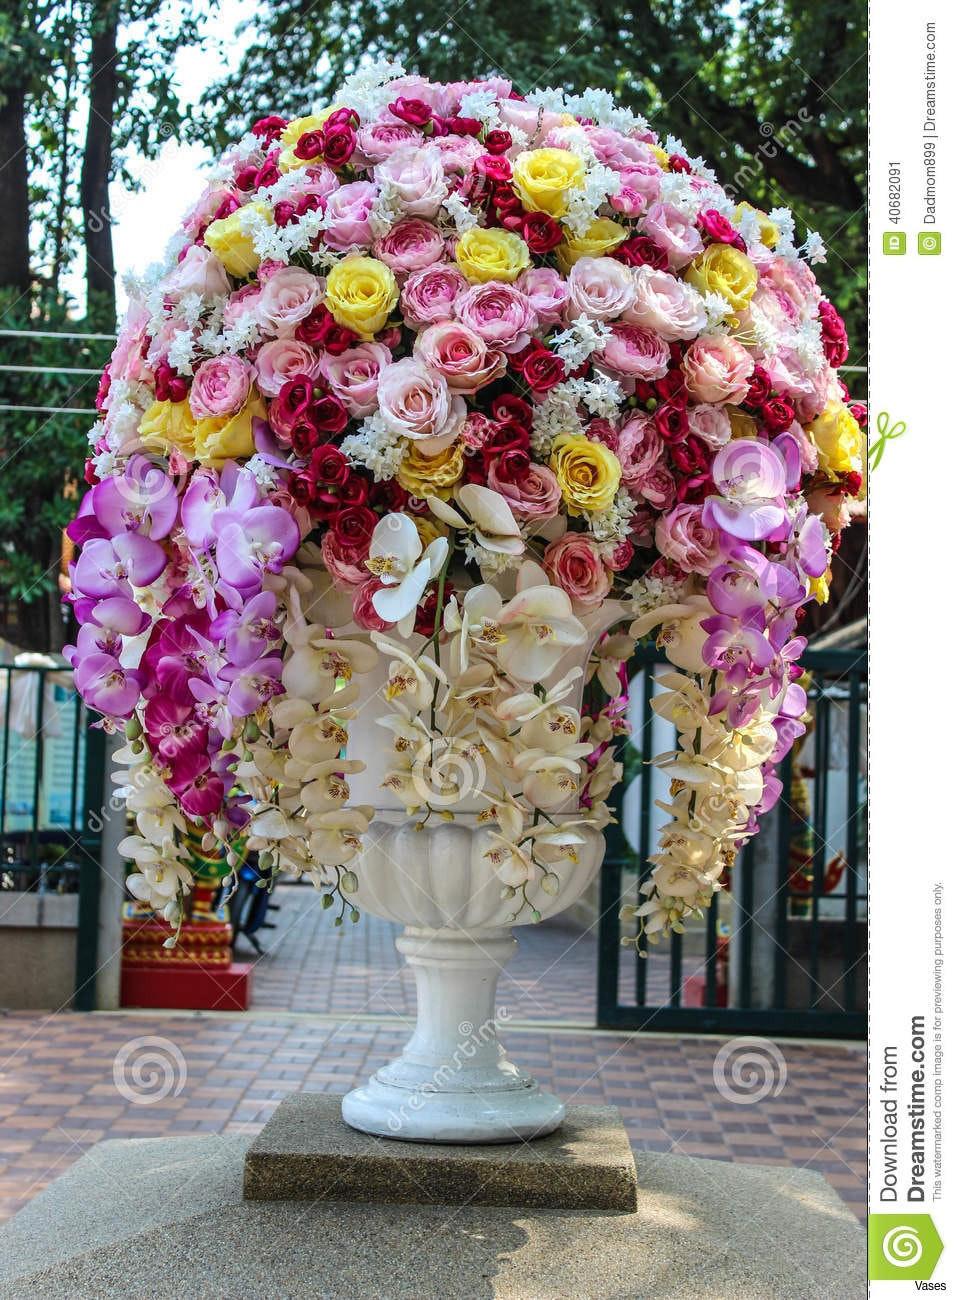 large tall floor vases of floor vases with flowers inspirational floor vase flowers design intended for floor vases with flowers fresh vases flower floor vase with flowersi 0d outdoor arrangements scheme of